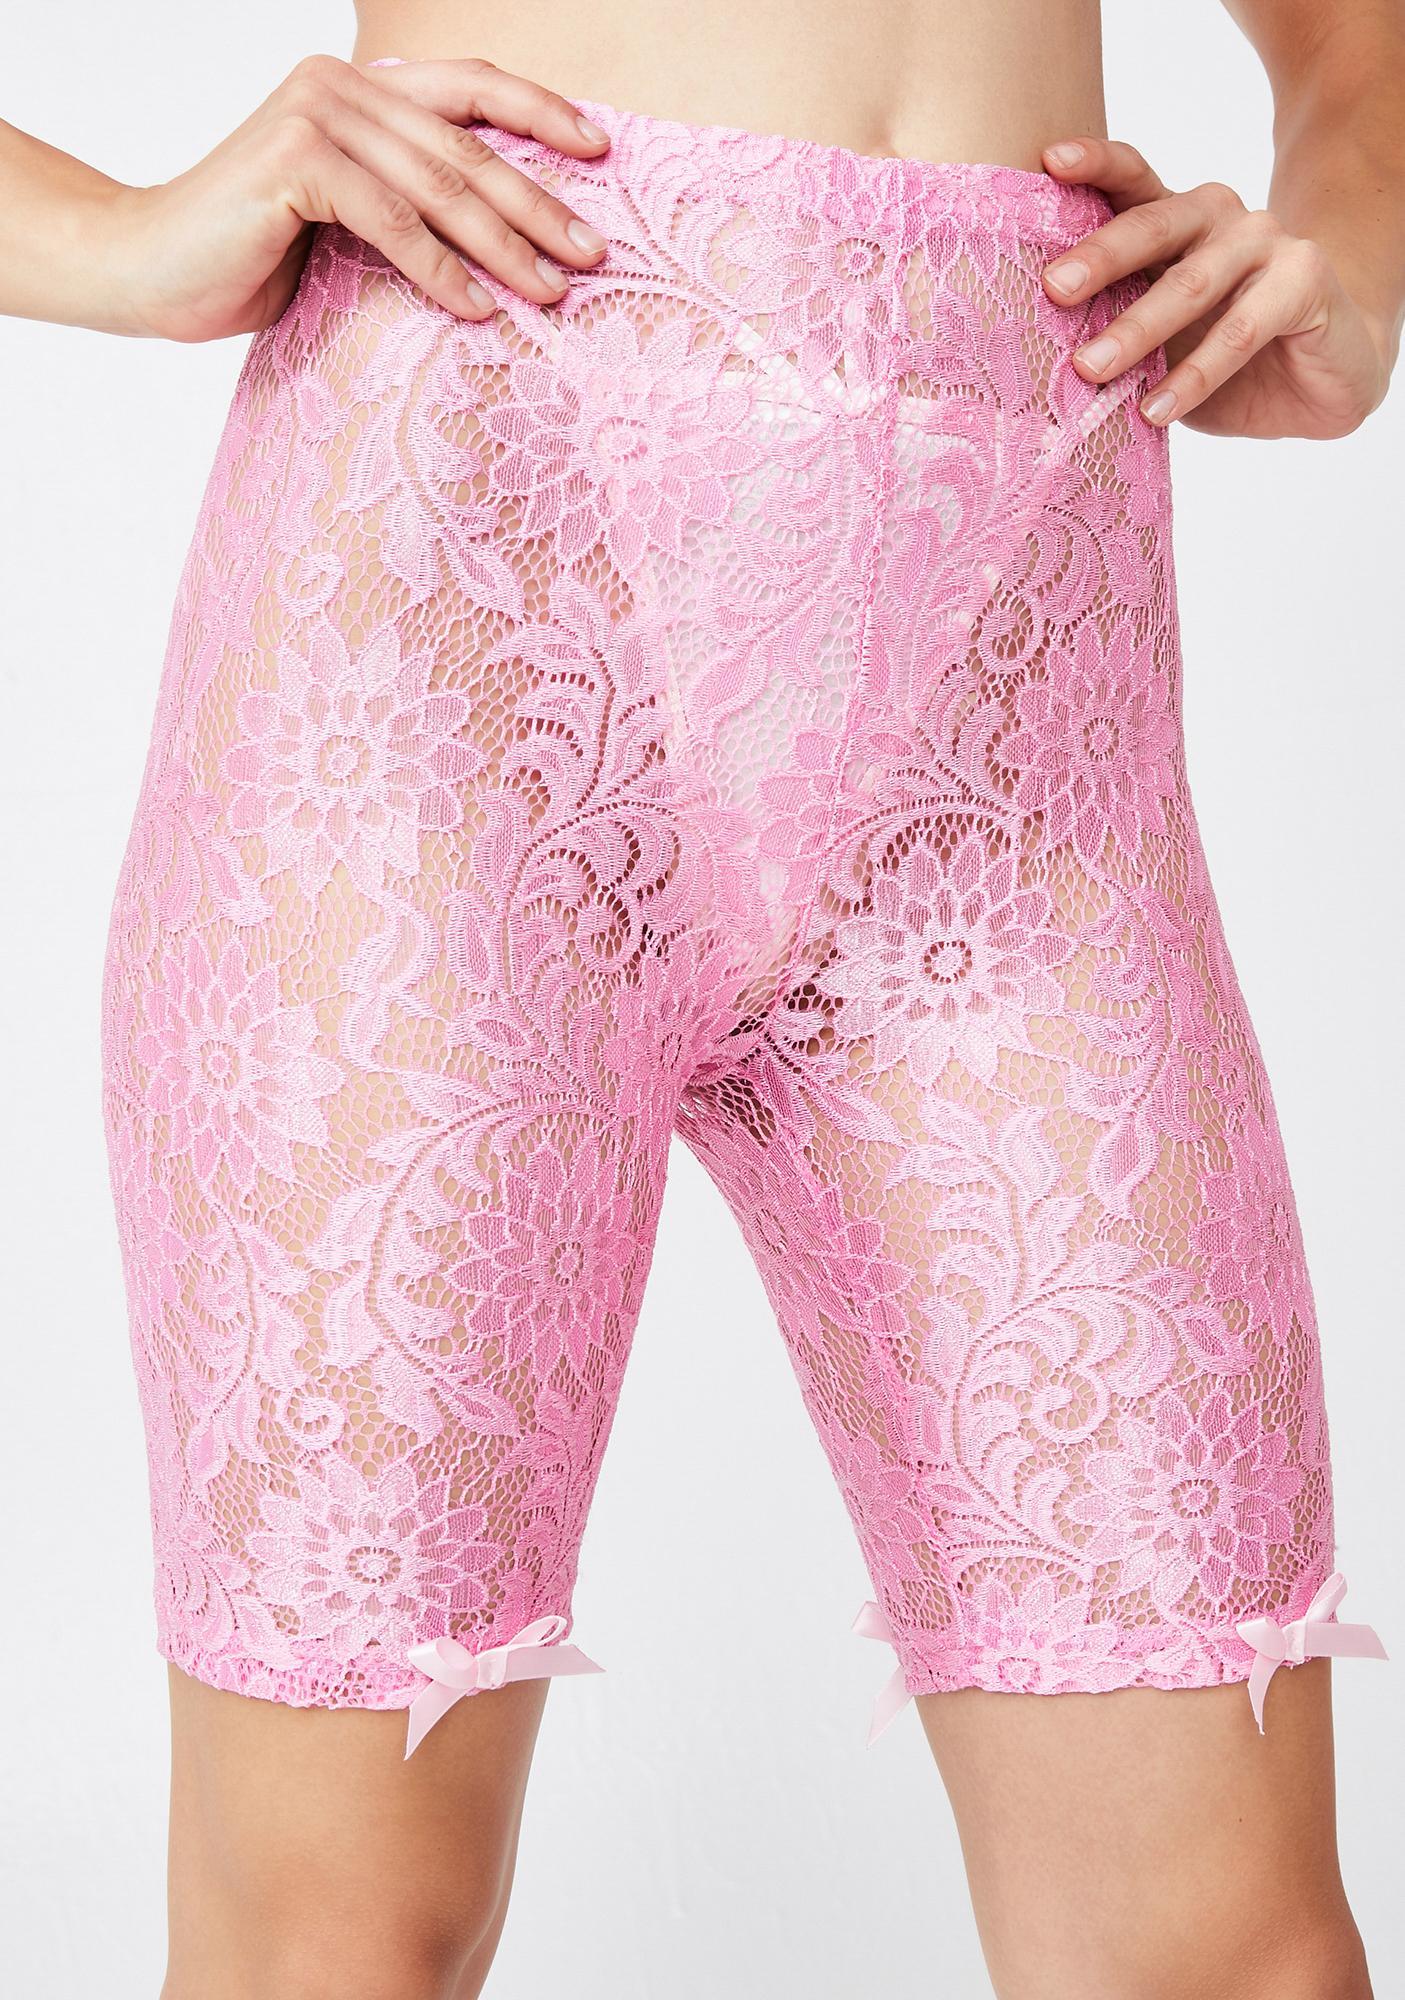 Sugar Thrillz Twinkle Tease Biker Shorts